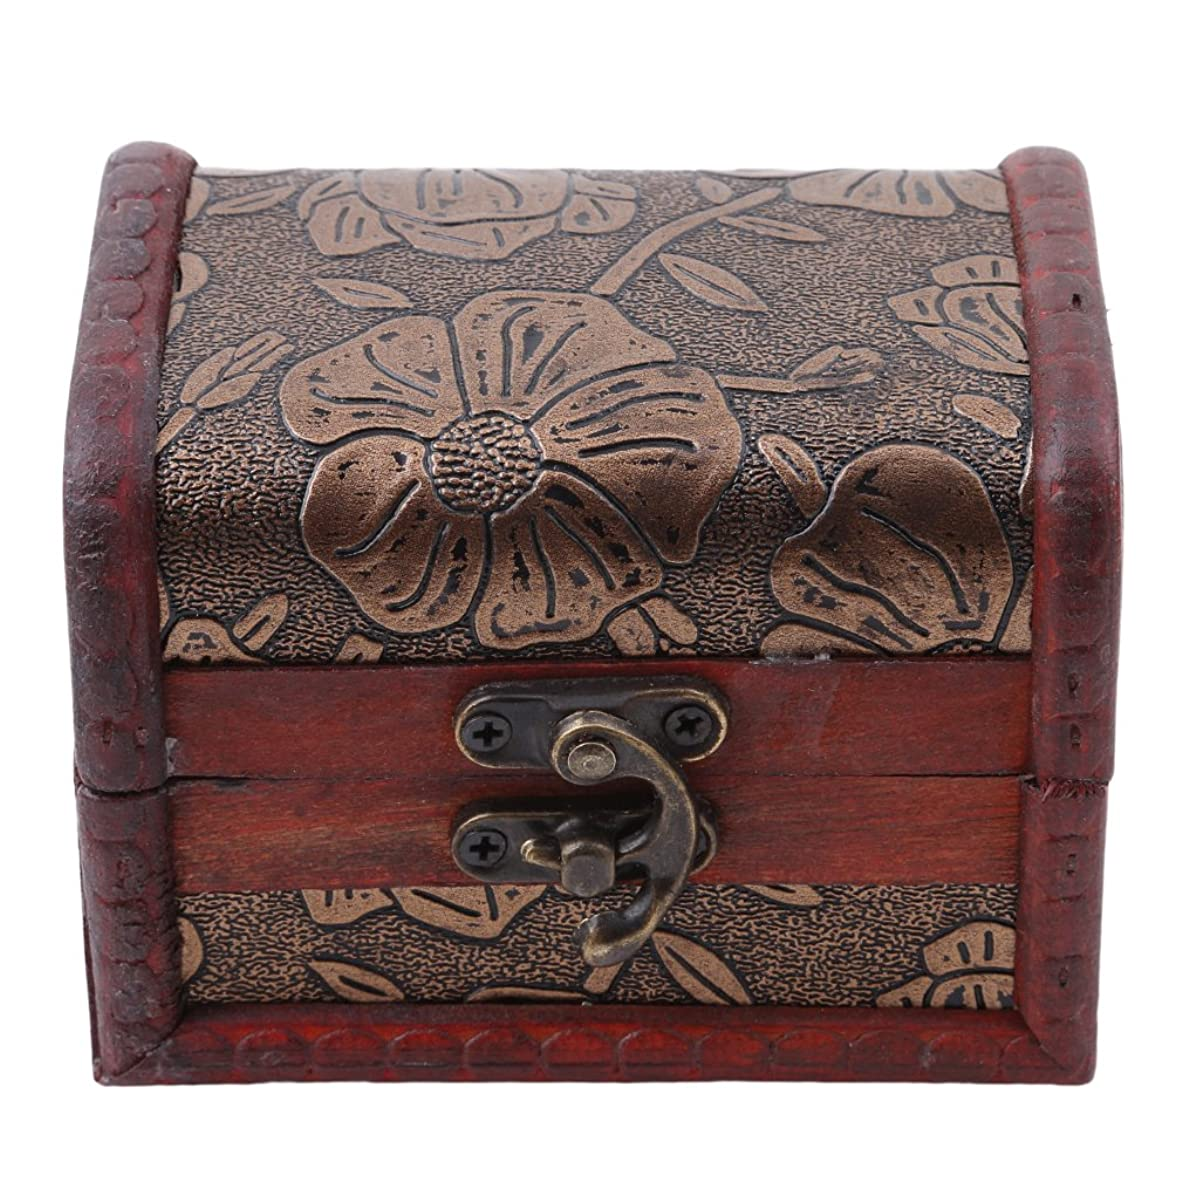 PINKING ジュエリーボックス 木製 アンティーク調 小物入れ 宝箱 オシャレ アクセサリー 小銭